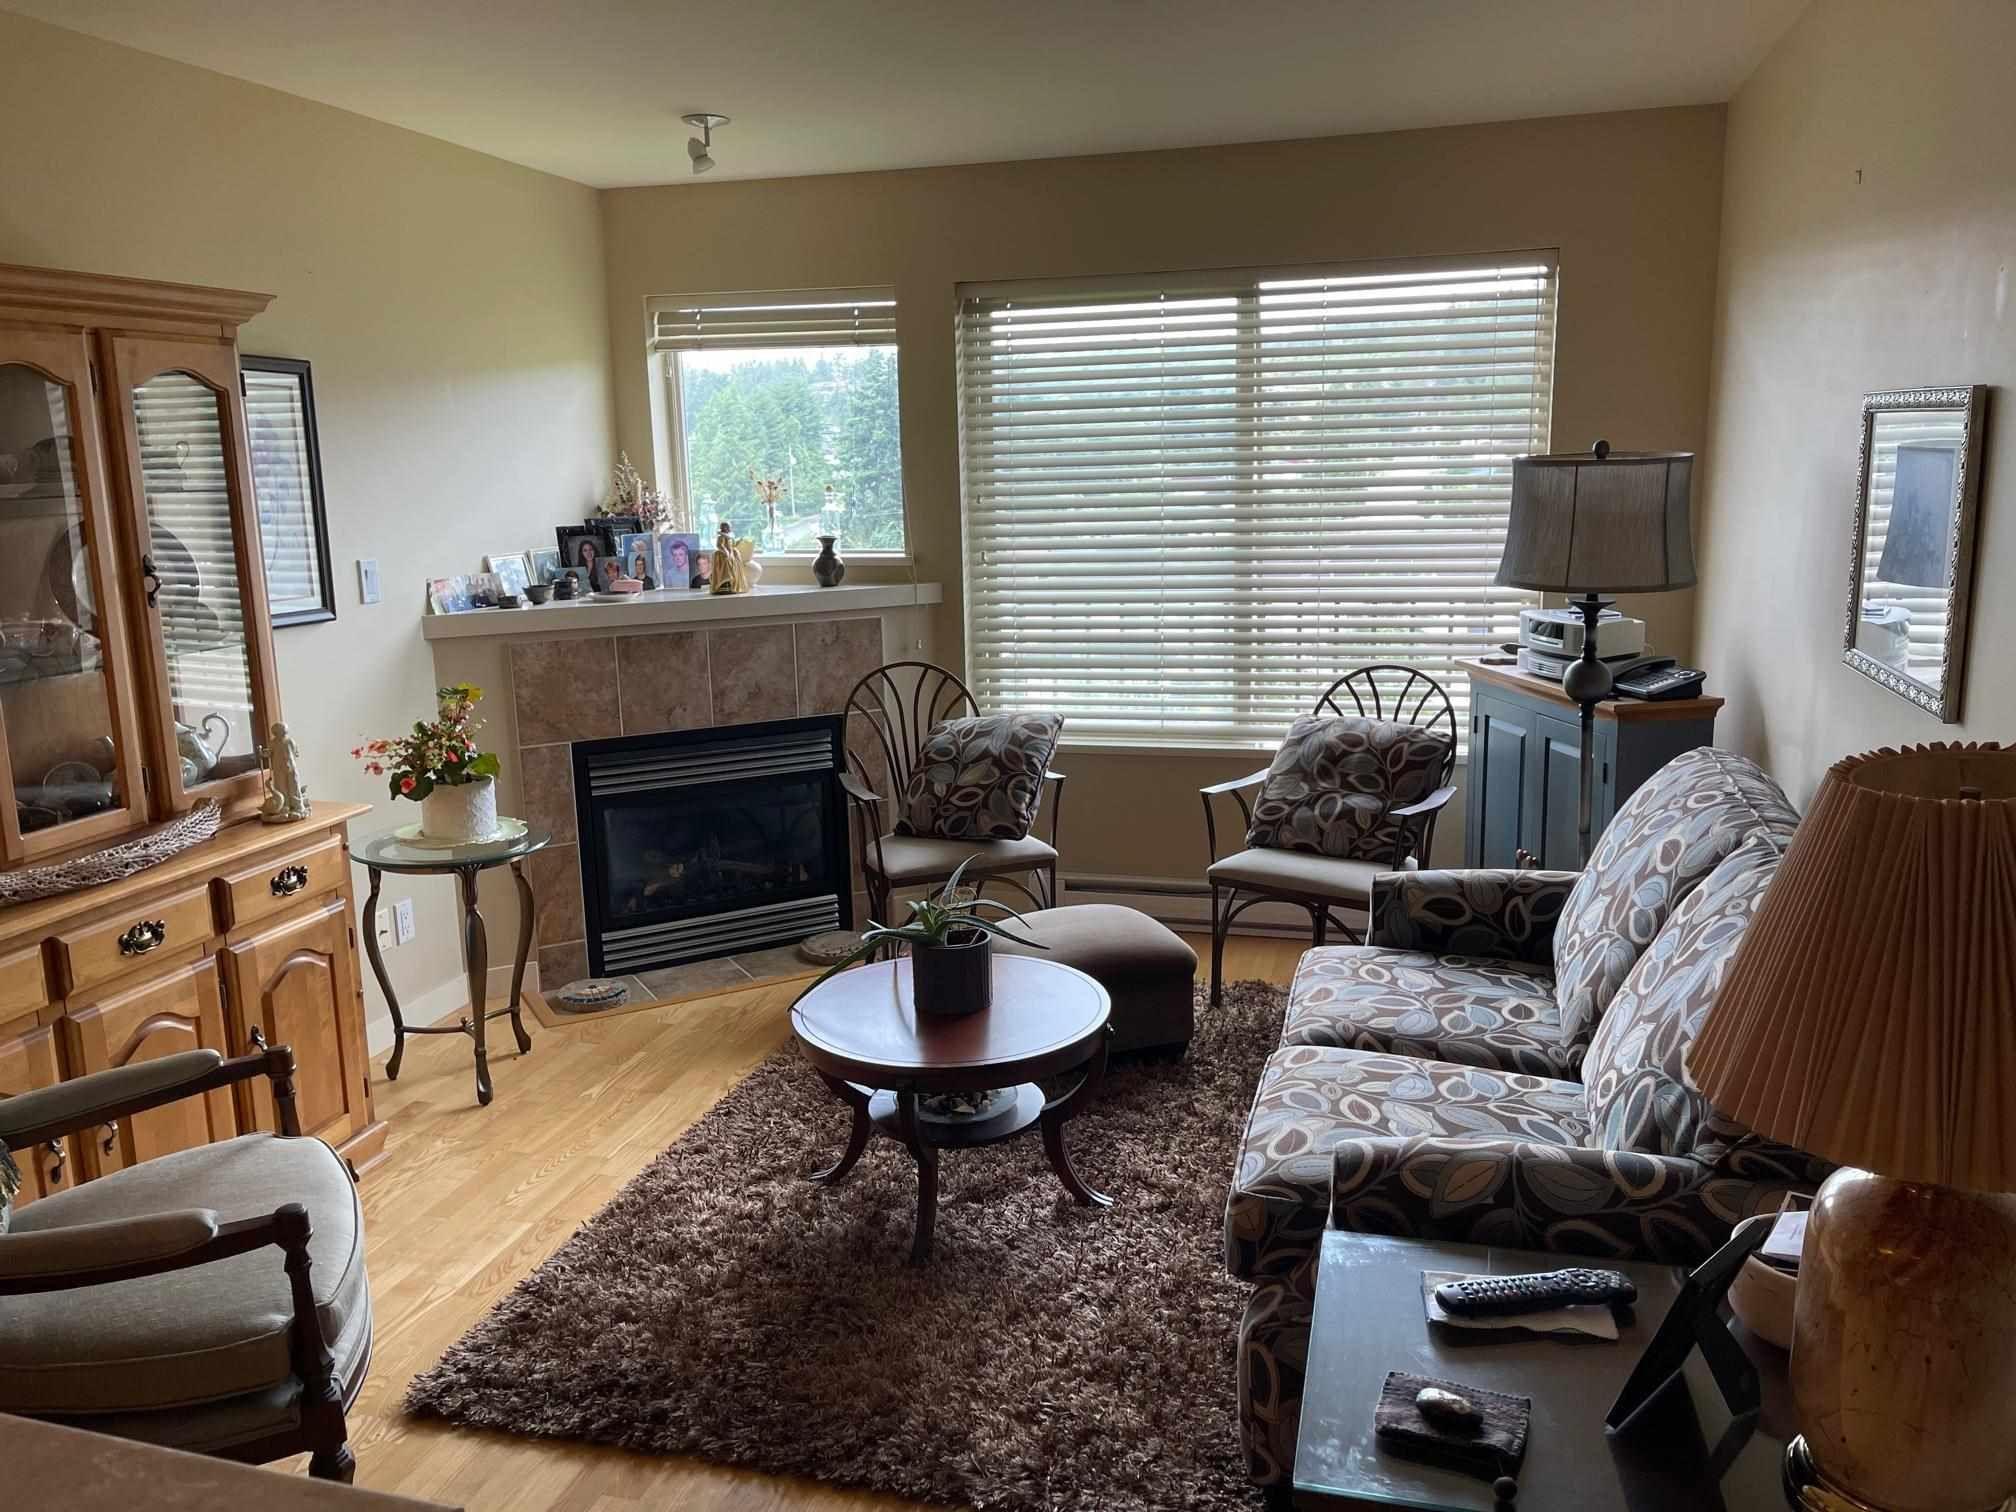 Main Photo: 407 5631 INLET Avenue in Sechelt: Sechelt District Condo for sale (Sunshine Coast)  : MLS®# R2596282